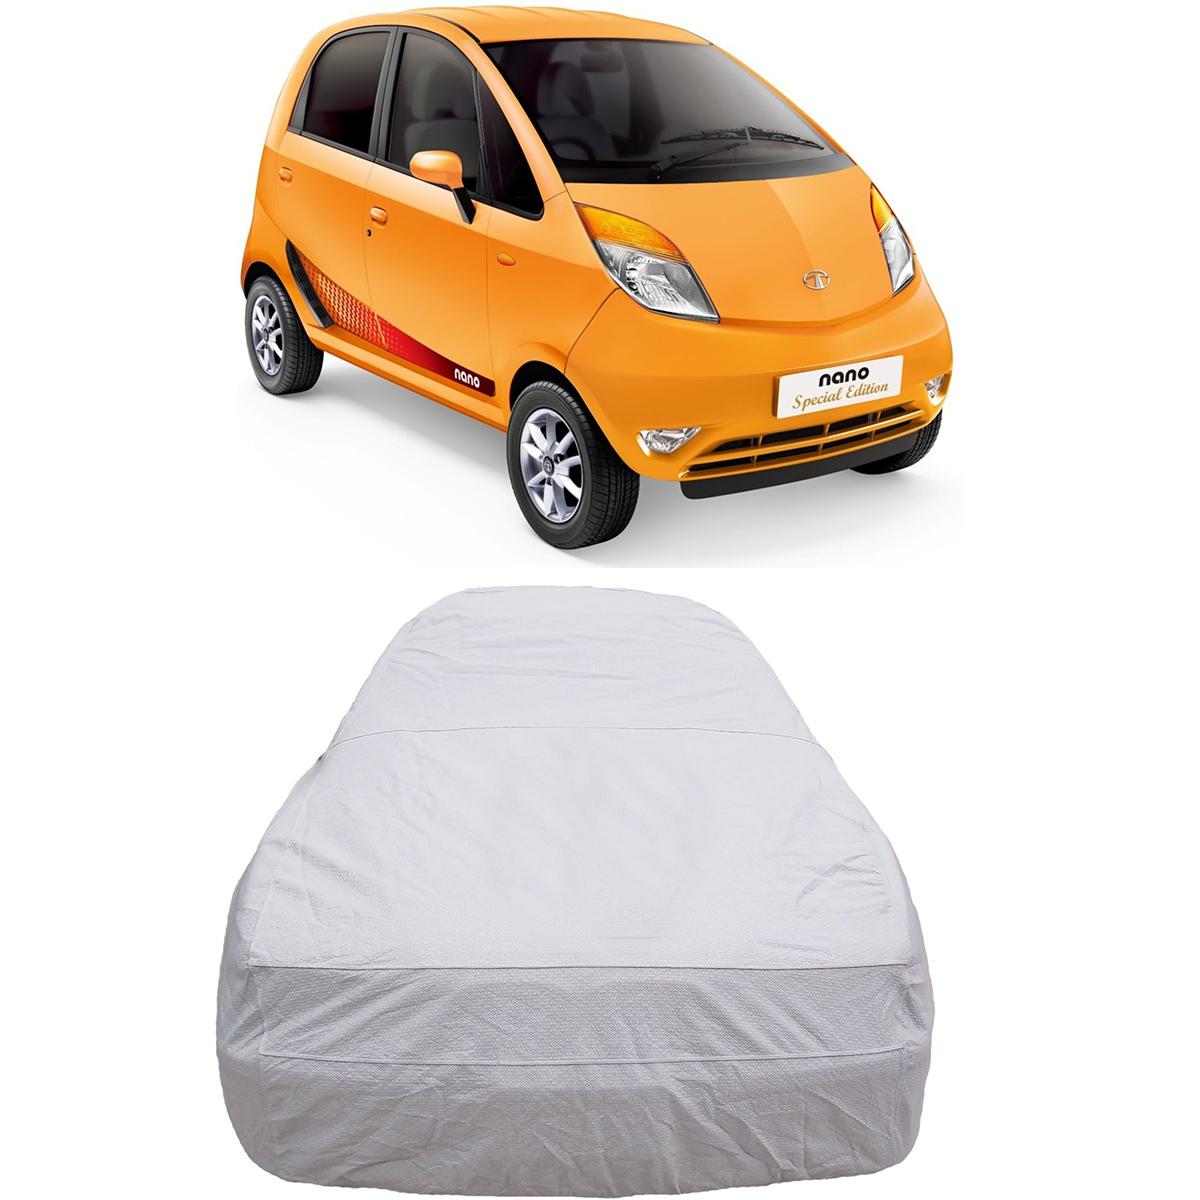 Buy digitru car body cover for tata nano silver online at best price in india on naaptol com